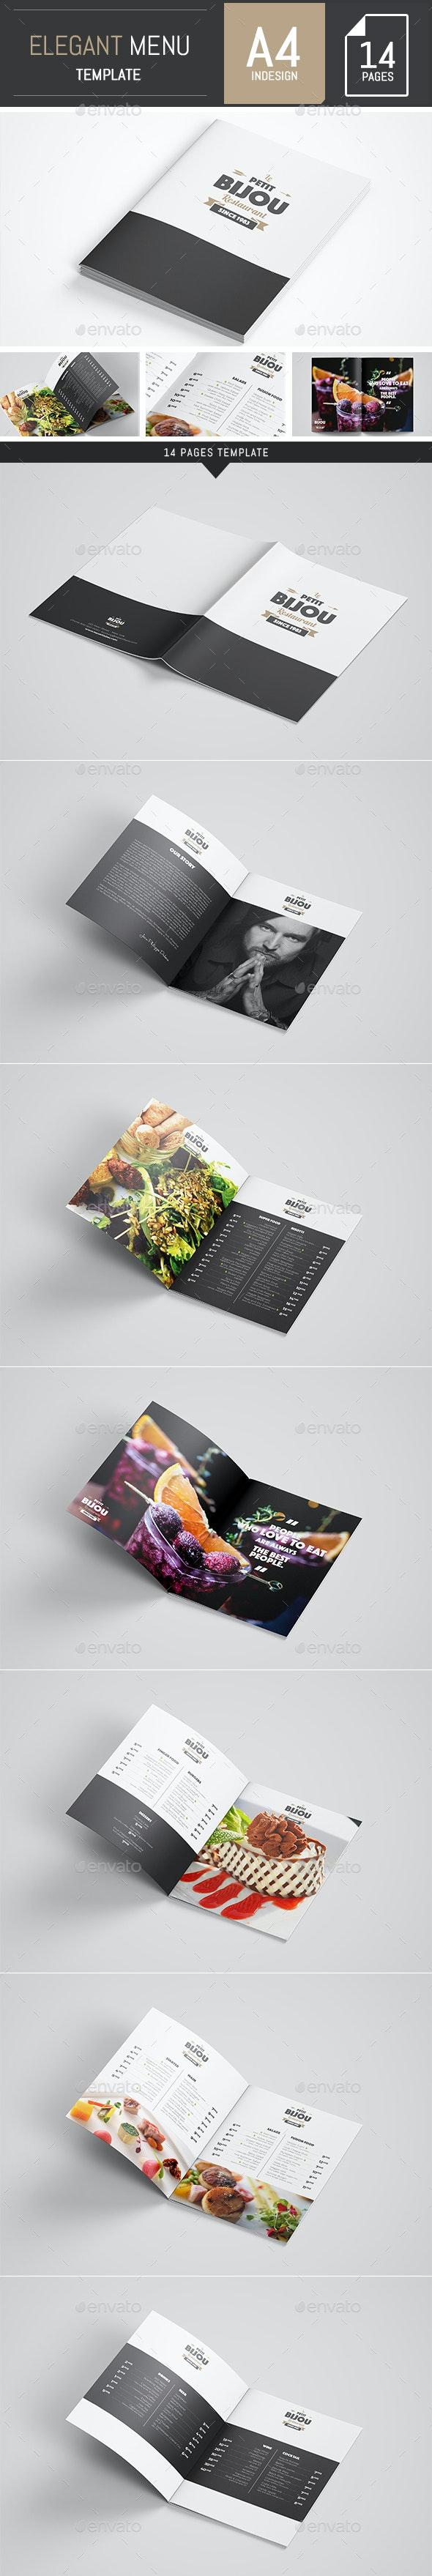 Elegant and Classy Food / Restaurant Menu A4 Brochure Template - Indesign - Food Menus Print Templates